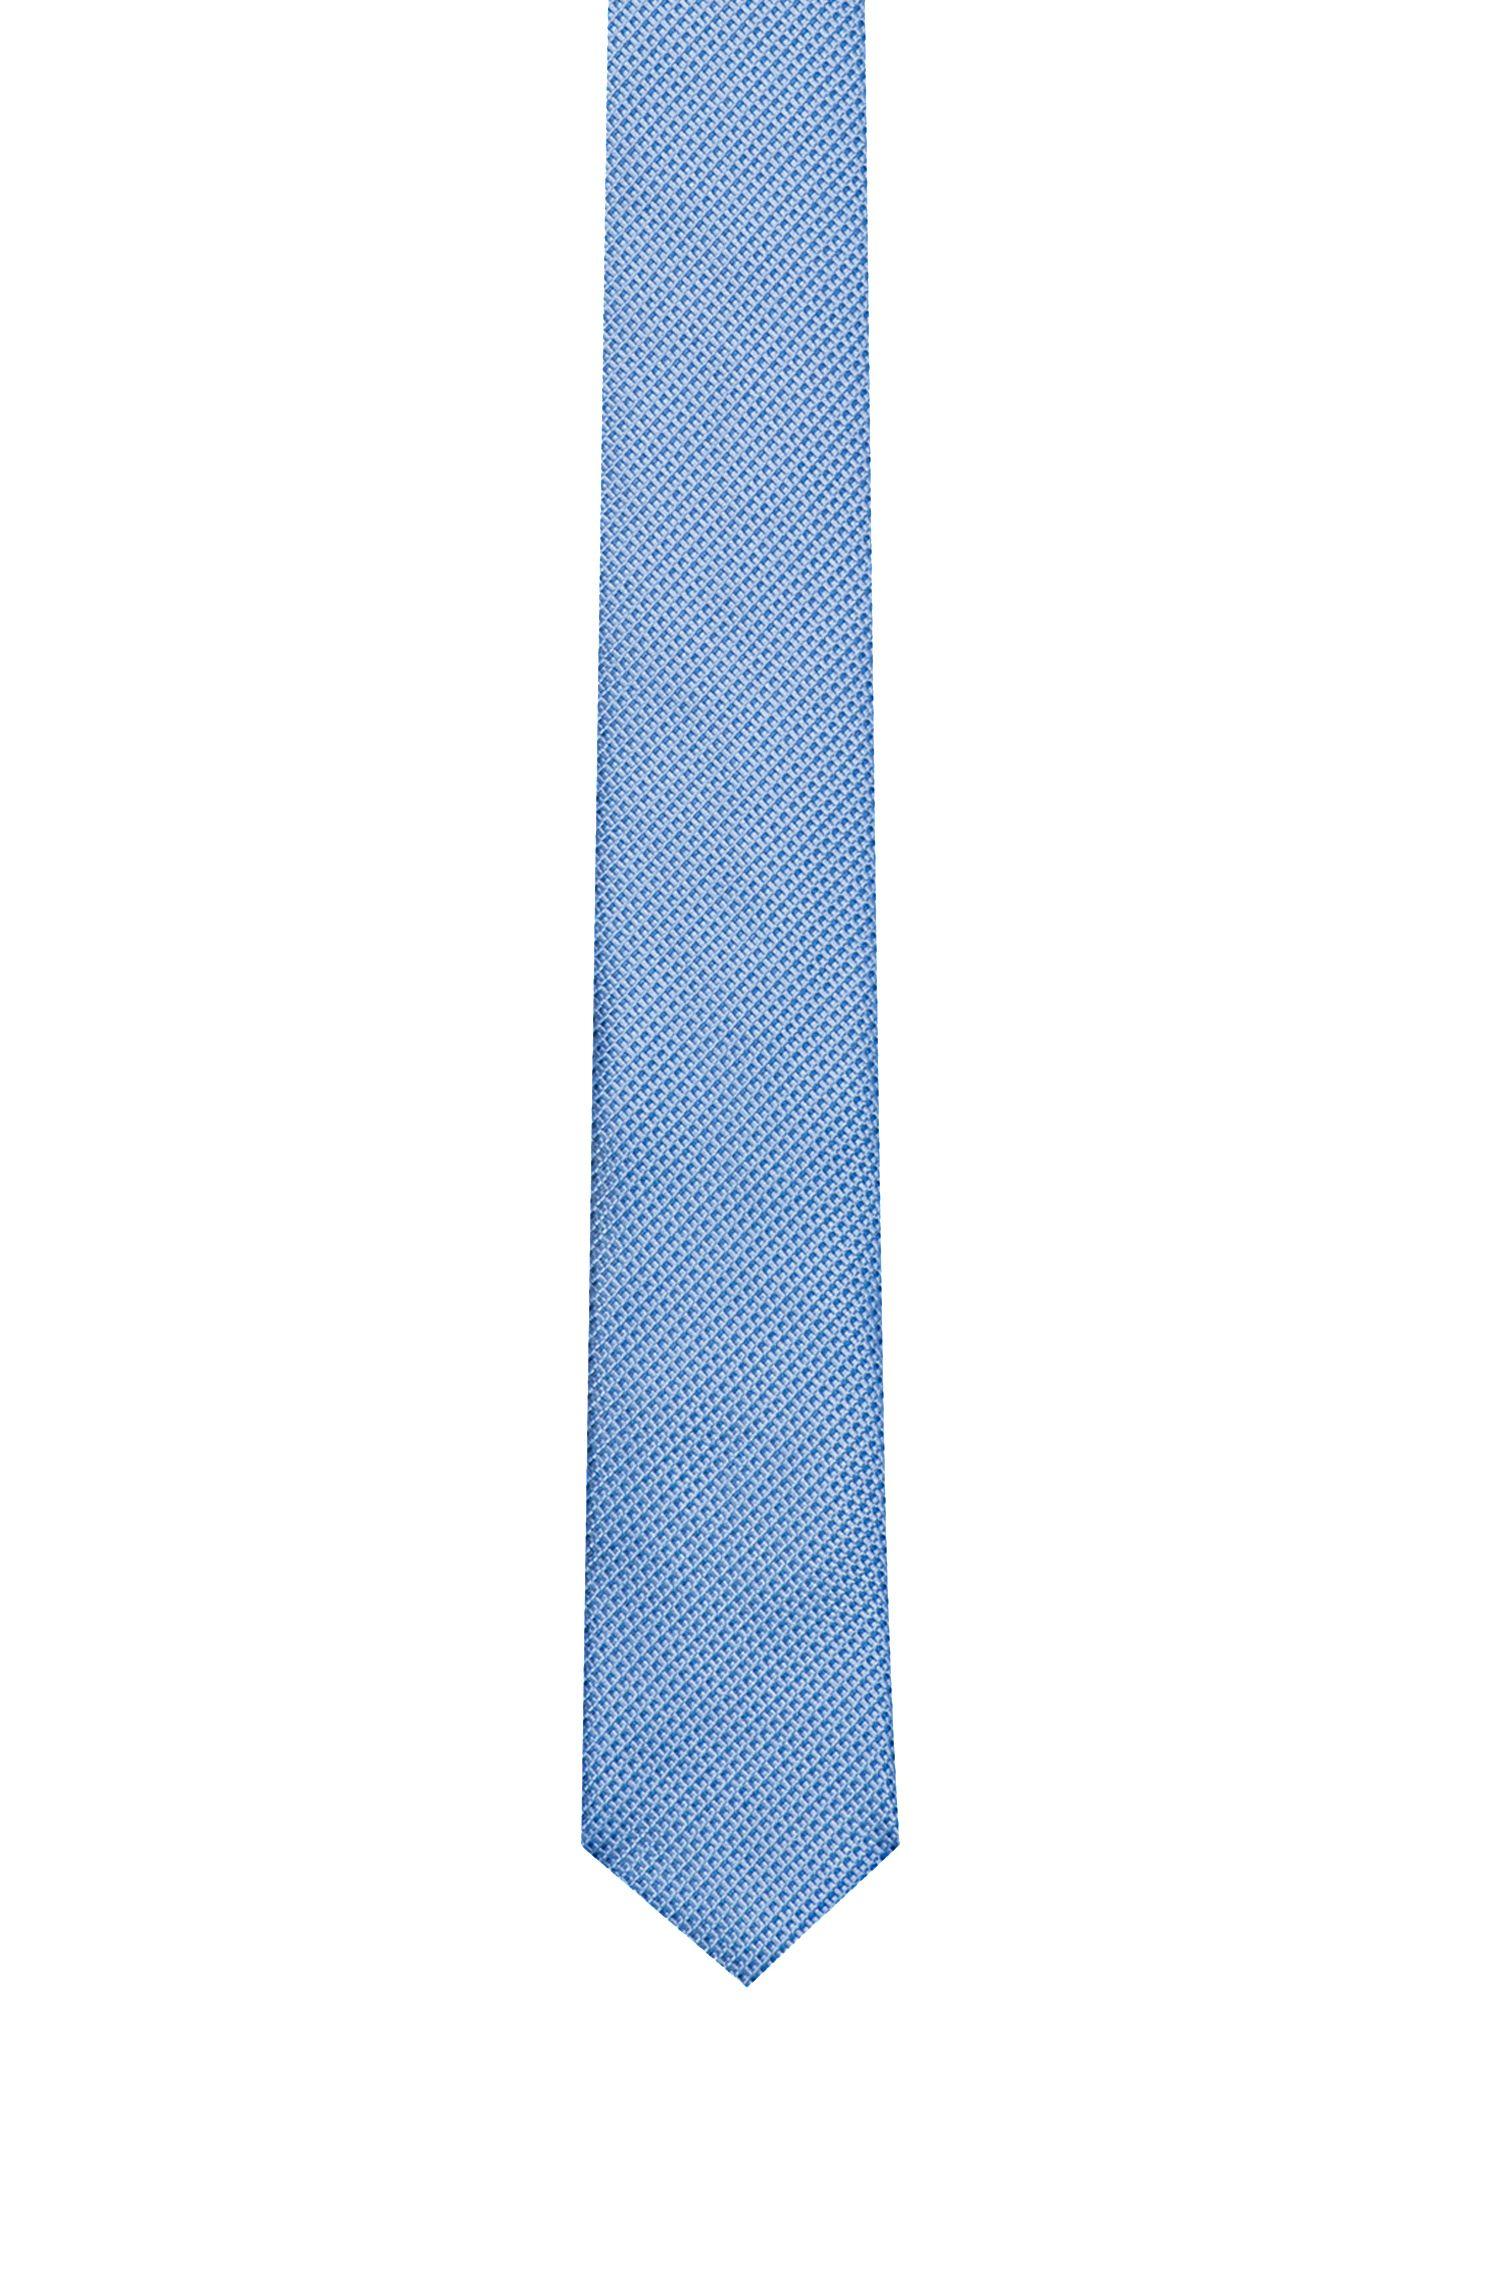 Moderna corbata de jacquard en seda con microestampado